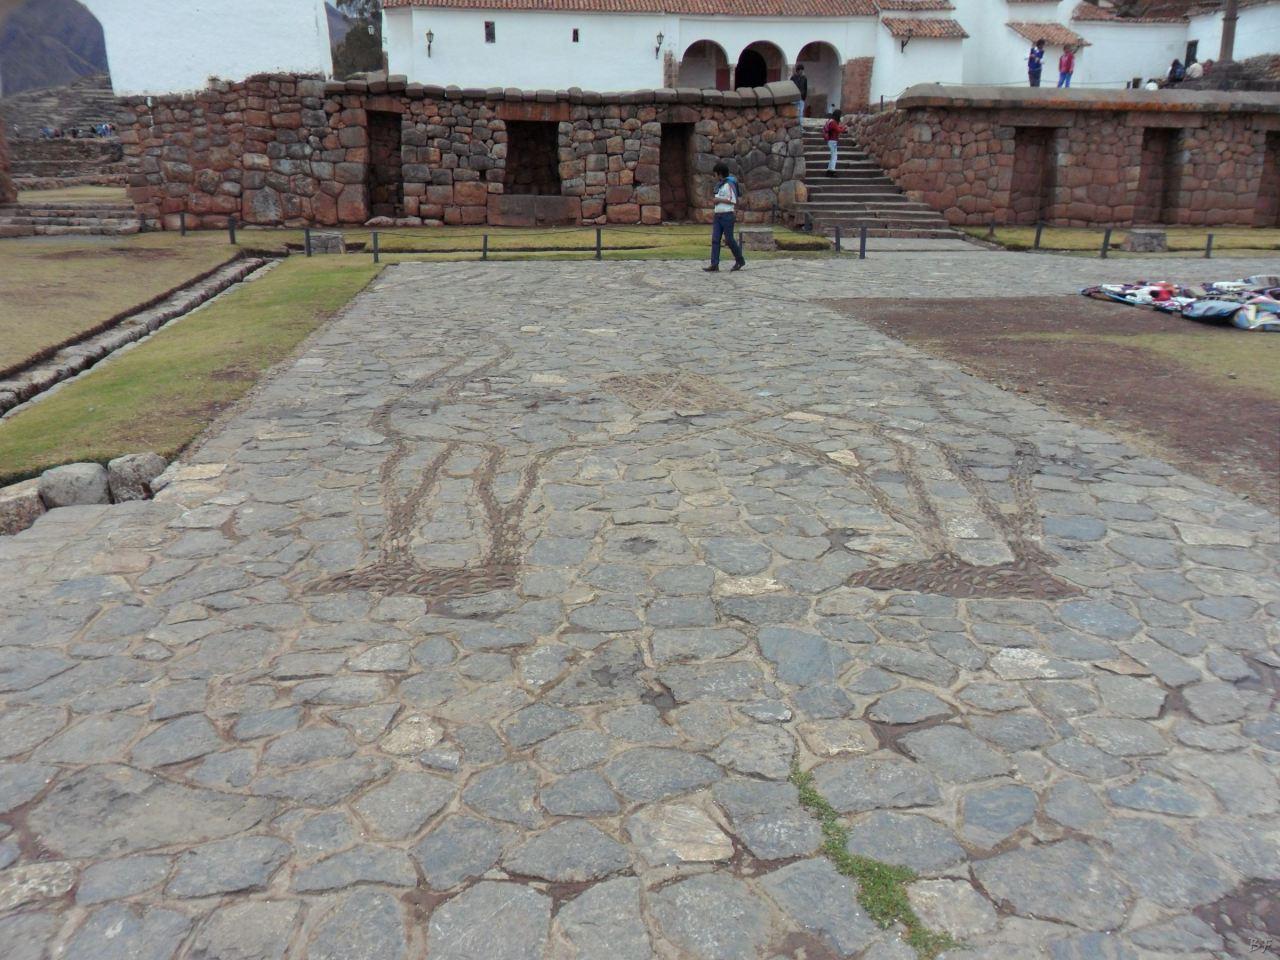 Chinchero-Mura-Poligonali-Piramide-Urubamba-Peru-6